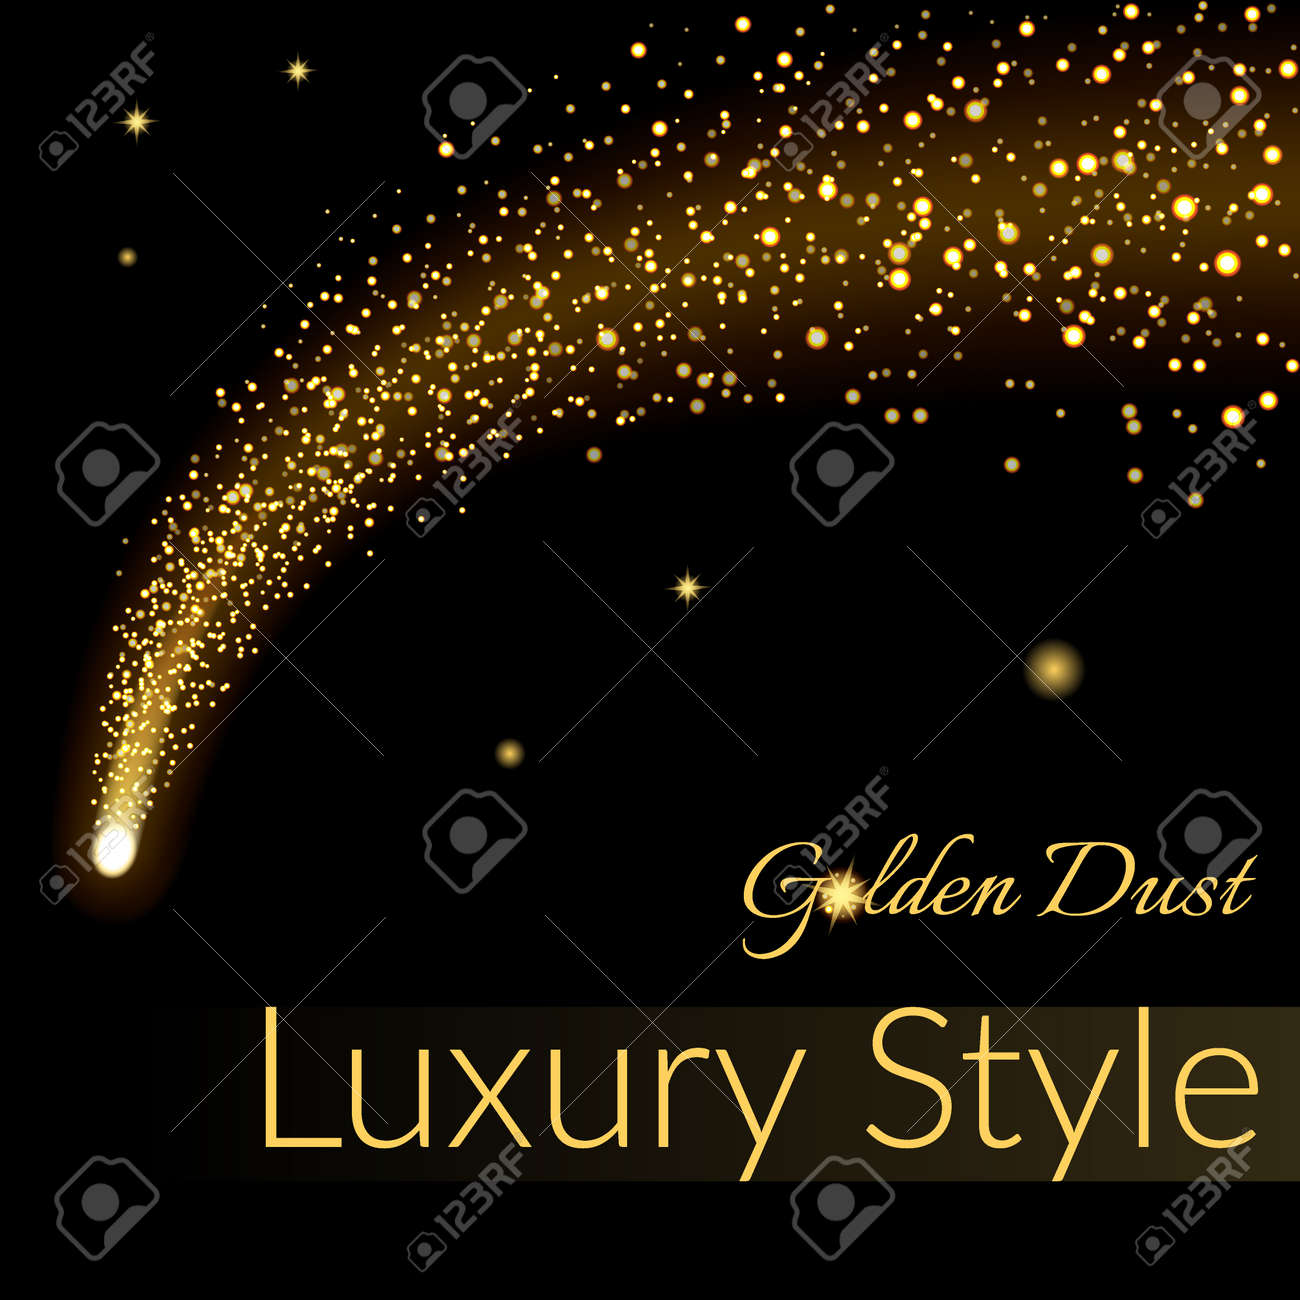 Golden sparkling falling star. Gold dust trail. Cosmic glittering wave in black background. Abstract Design template. Lights, glitter, sparkles. Fashion stylish retro design. Stock Vector illustration - 52490381